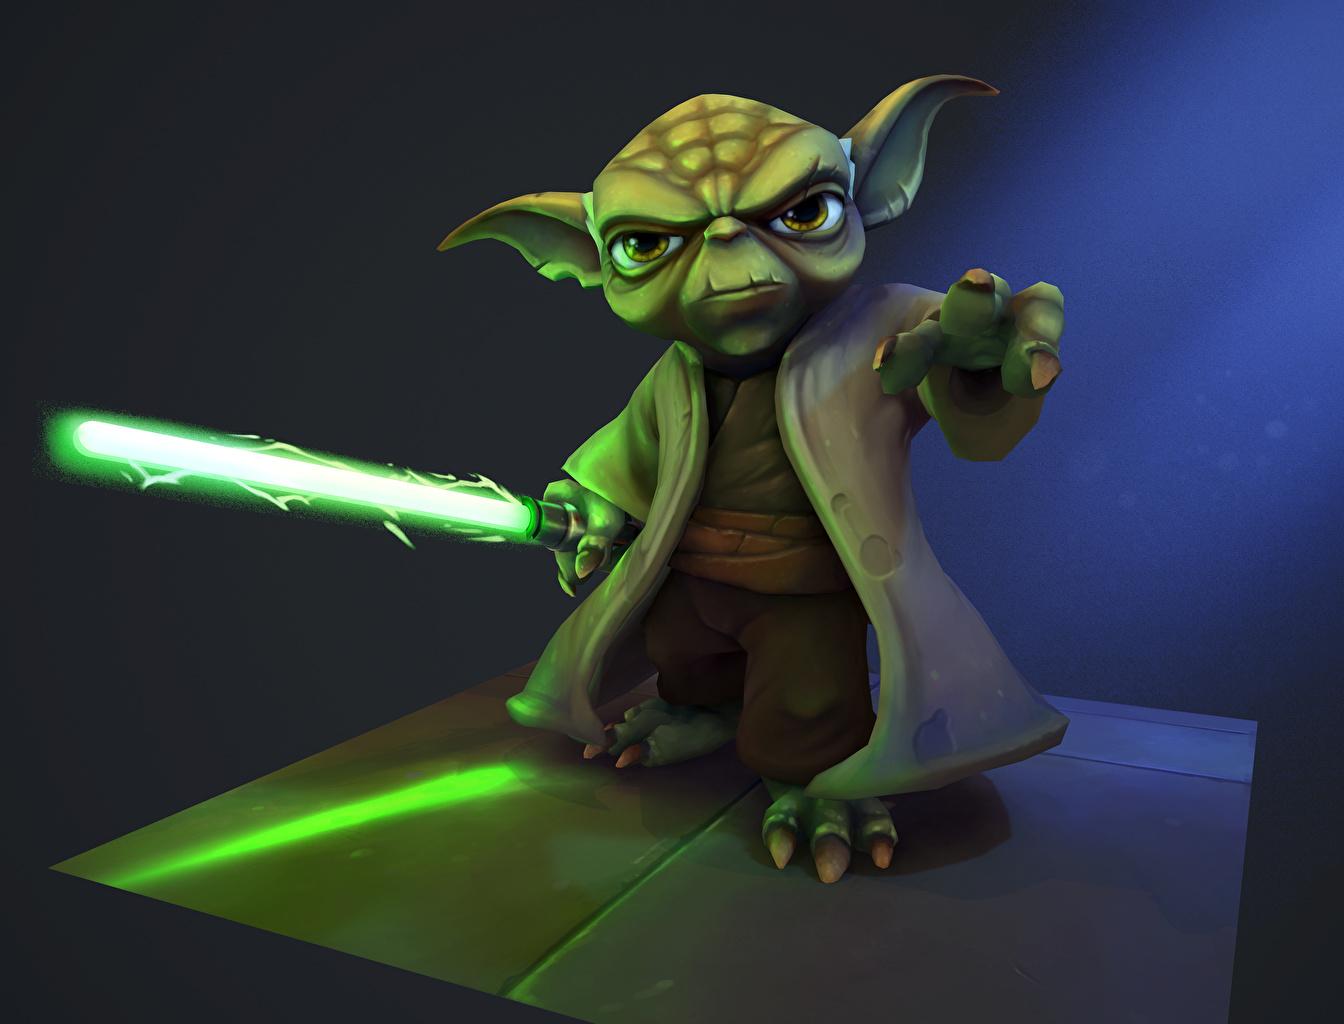 Desktop Wallpapers 3d Graphics Star Wars Movies Lightsaber Swords